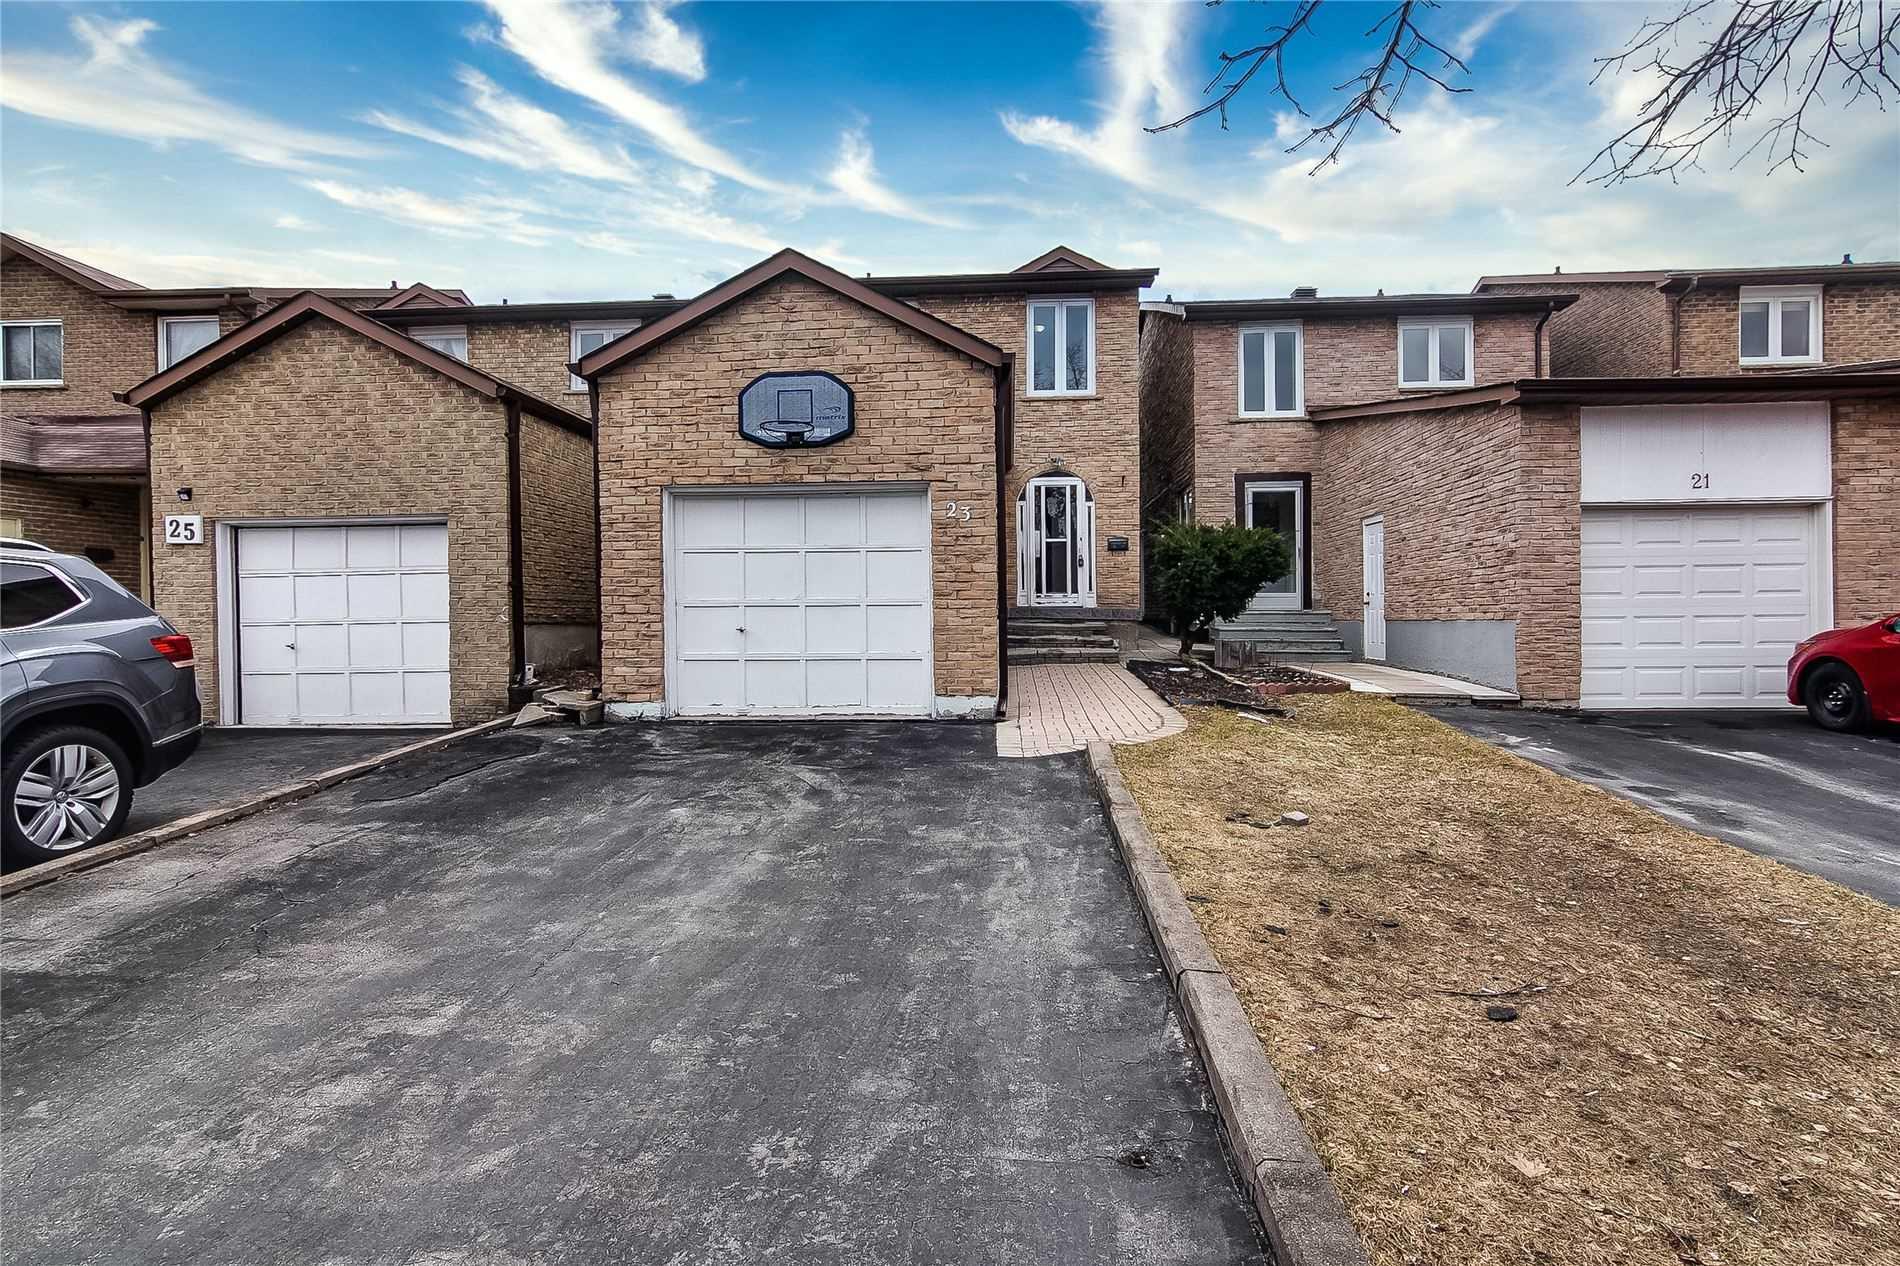 23 Maitland Dr, Markham, Ontario L3R4M6, 4 Bedrooms Bedrooms, 8 Rooms Rooms,4 BathroomsBathrooms,Detached,For Sale,Maitland,N4765519